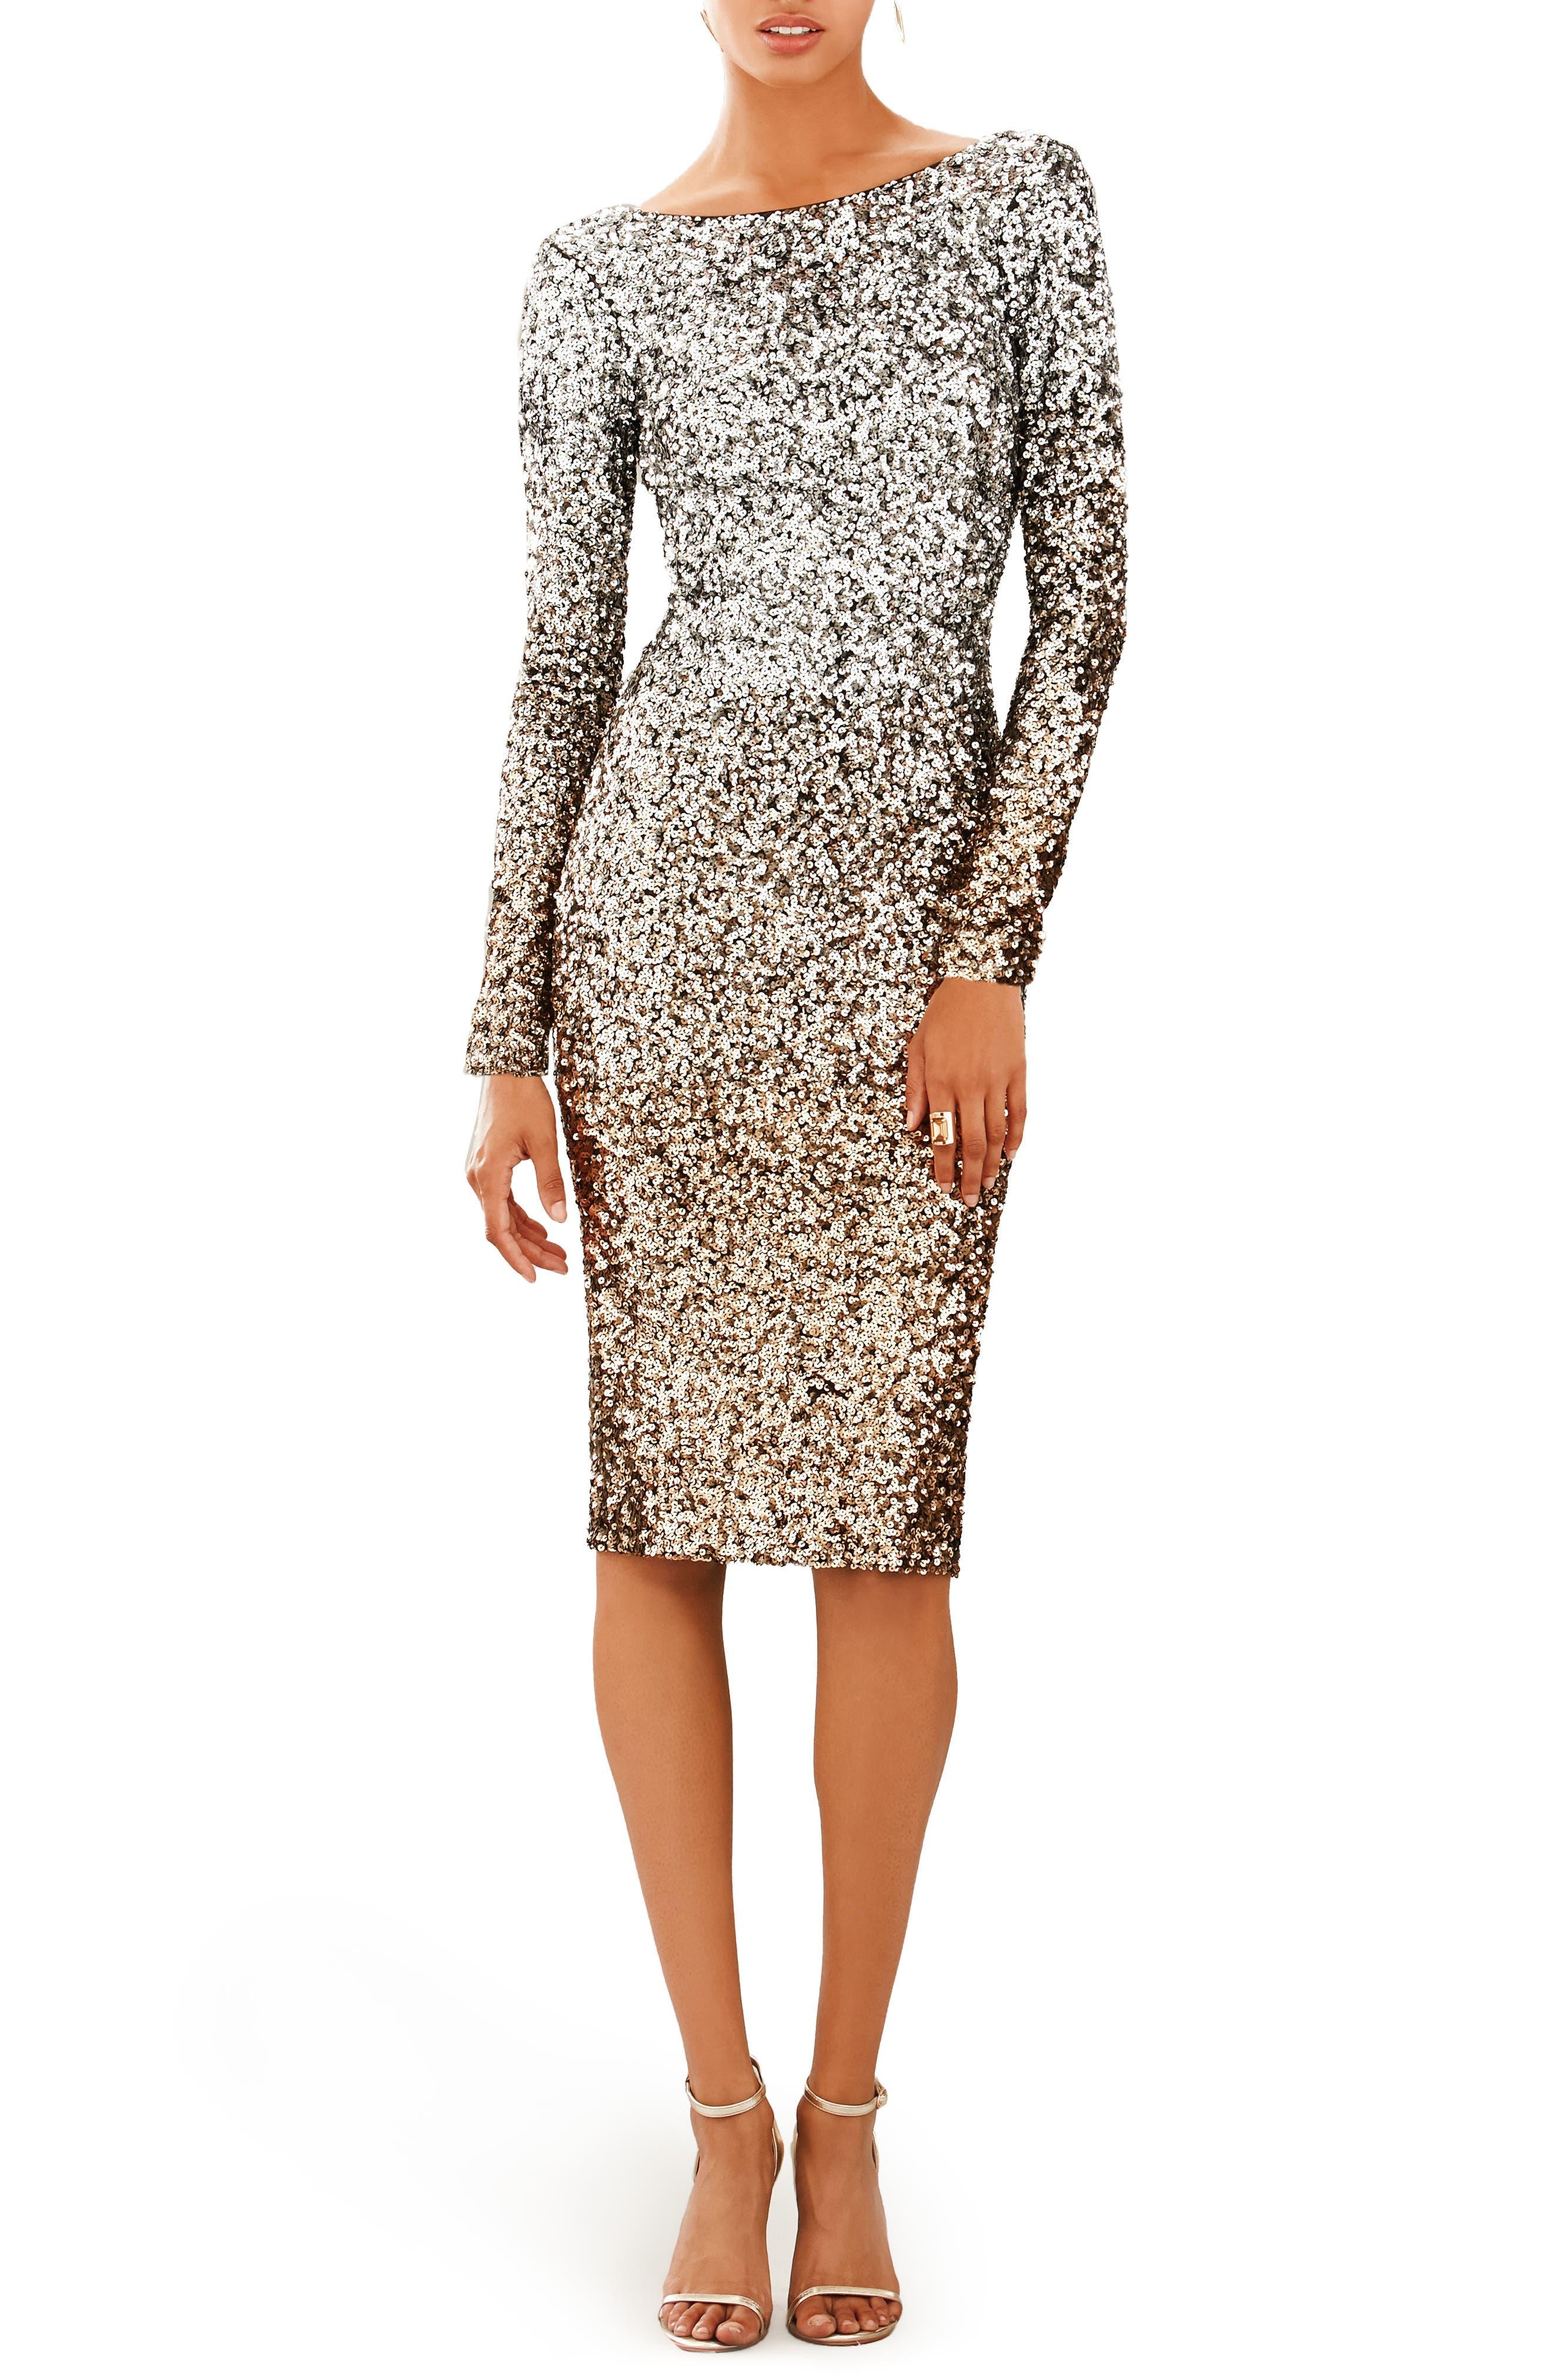 Emery Ombré Sequin Body-Con Dress,                             Main thumbnail 1, color,                             045